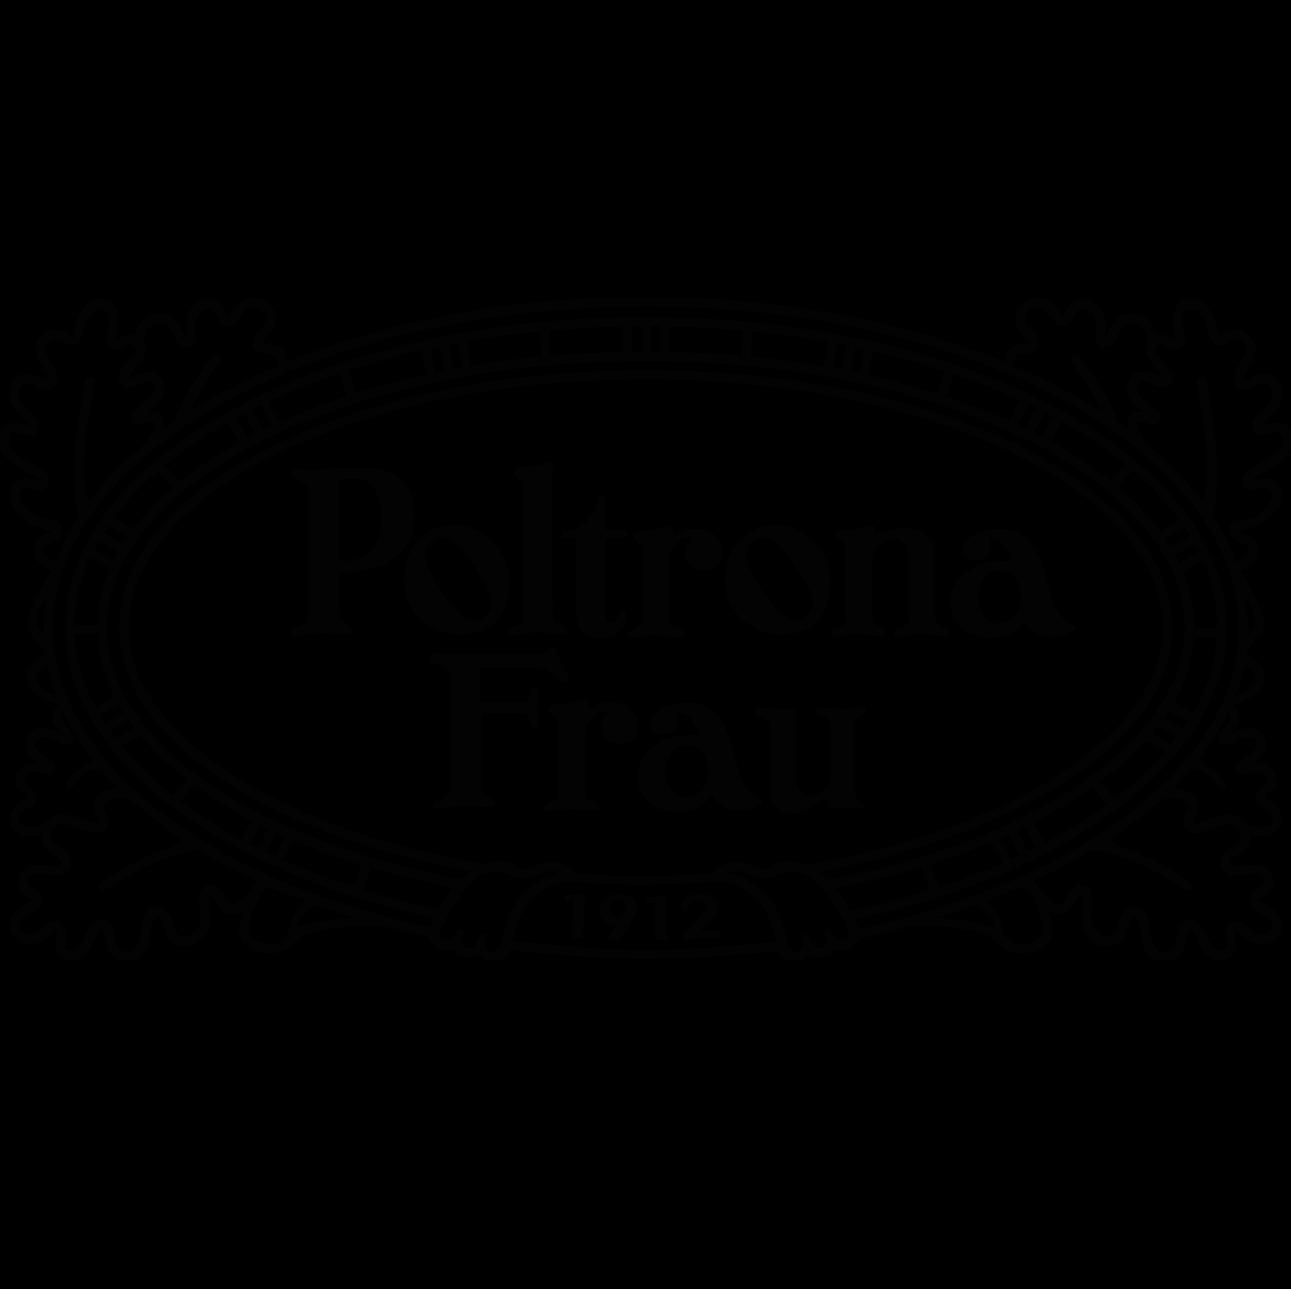 poltrona-frau-nero1